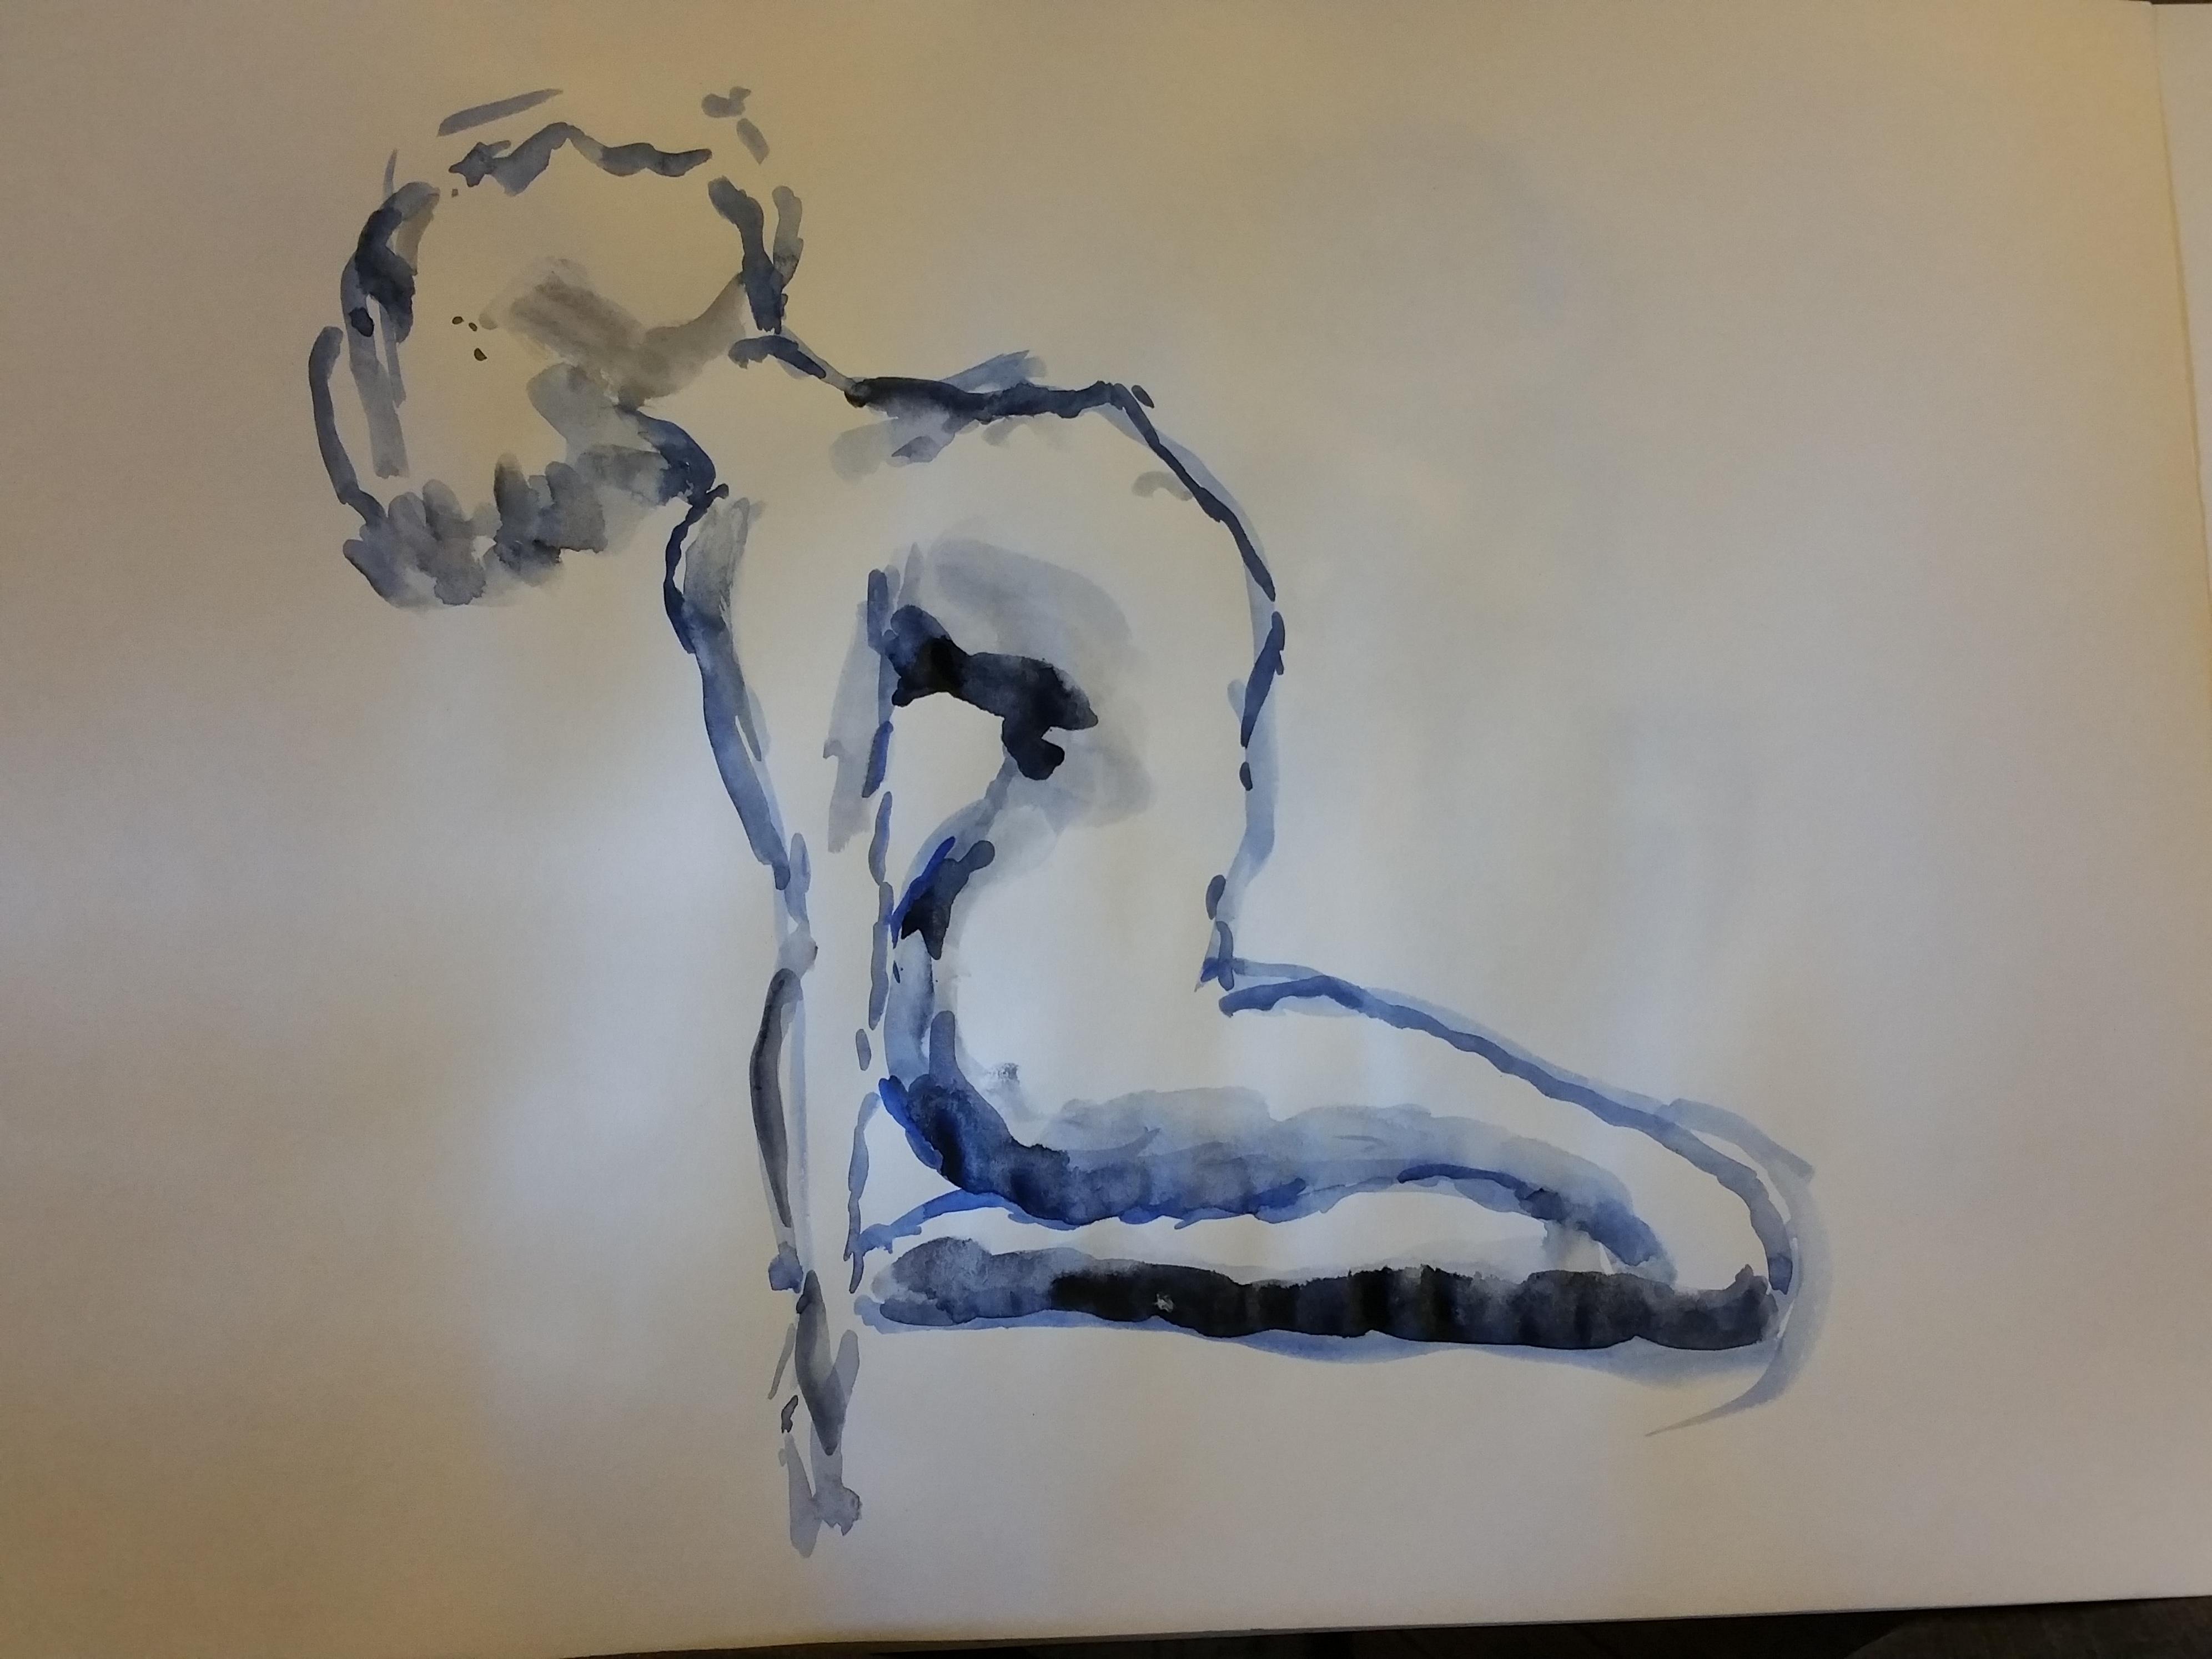 aquarelle bleu pause cambre dessin  cours de dessin